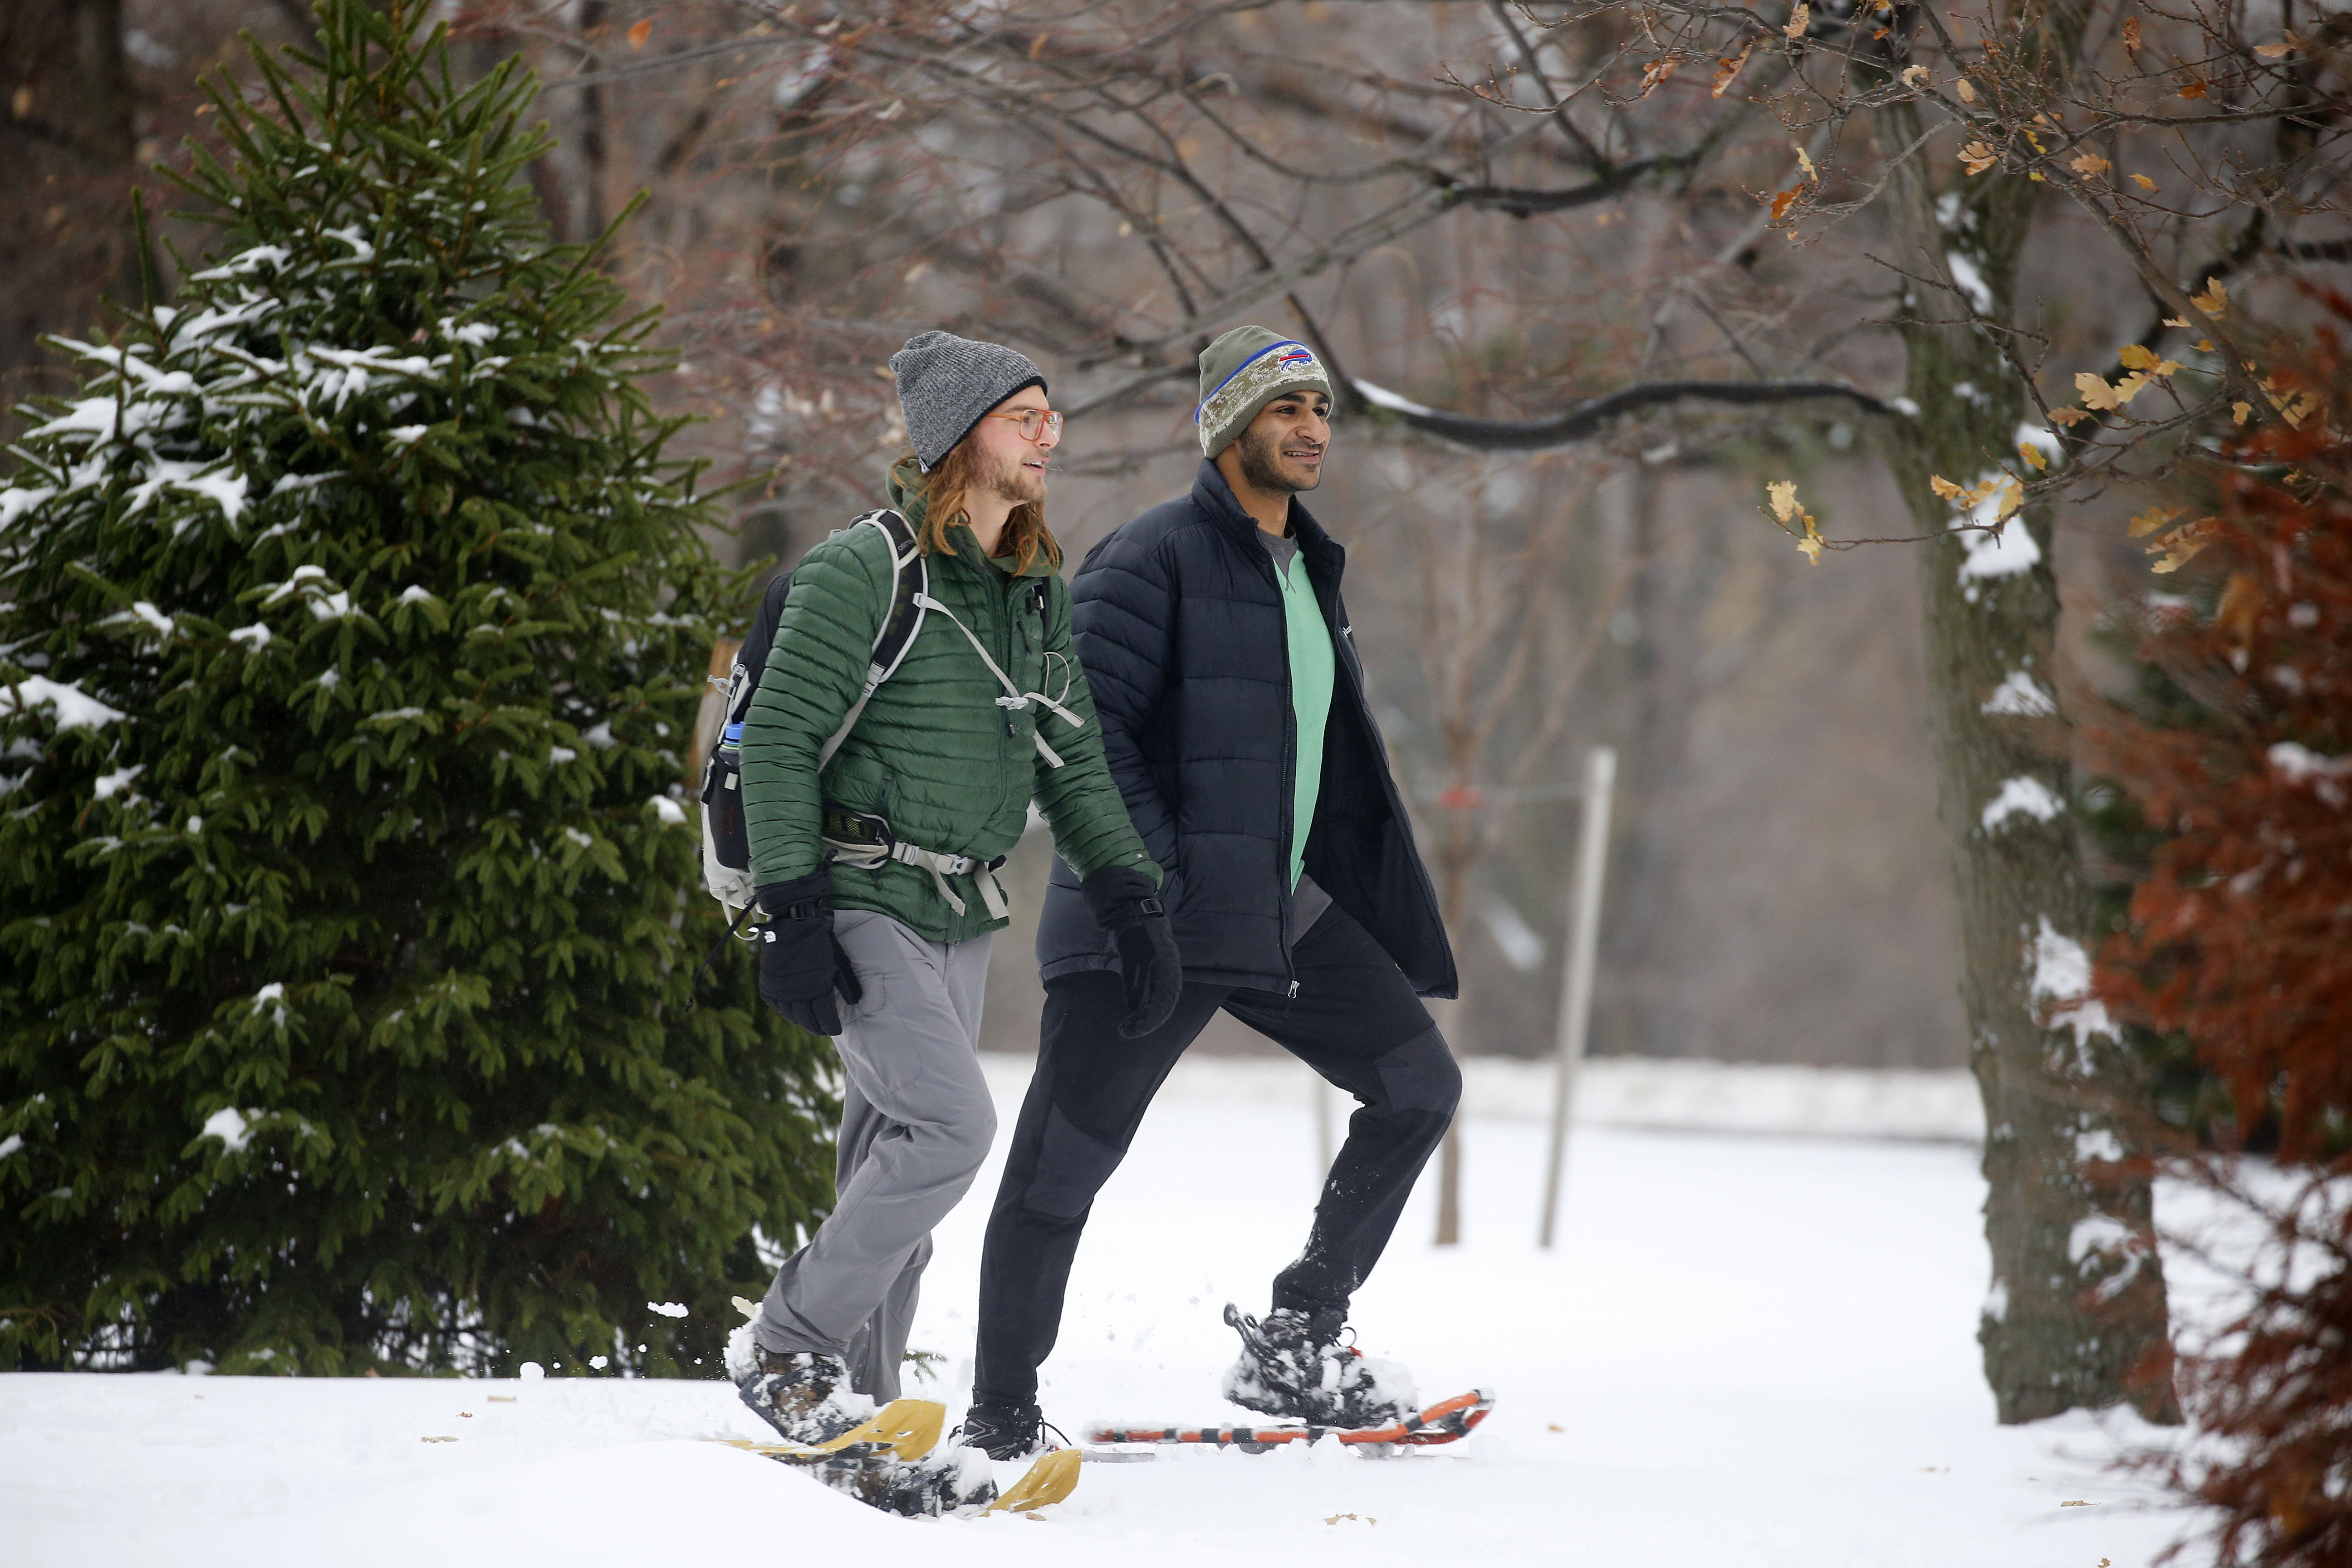 Savoring the splendor of a winter hike